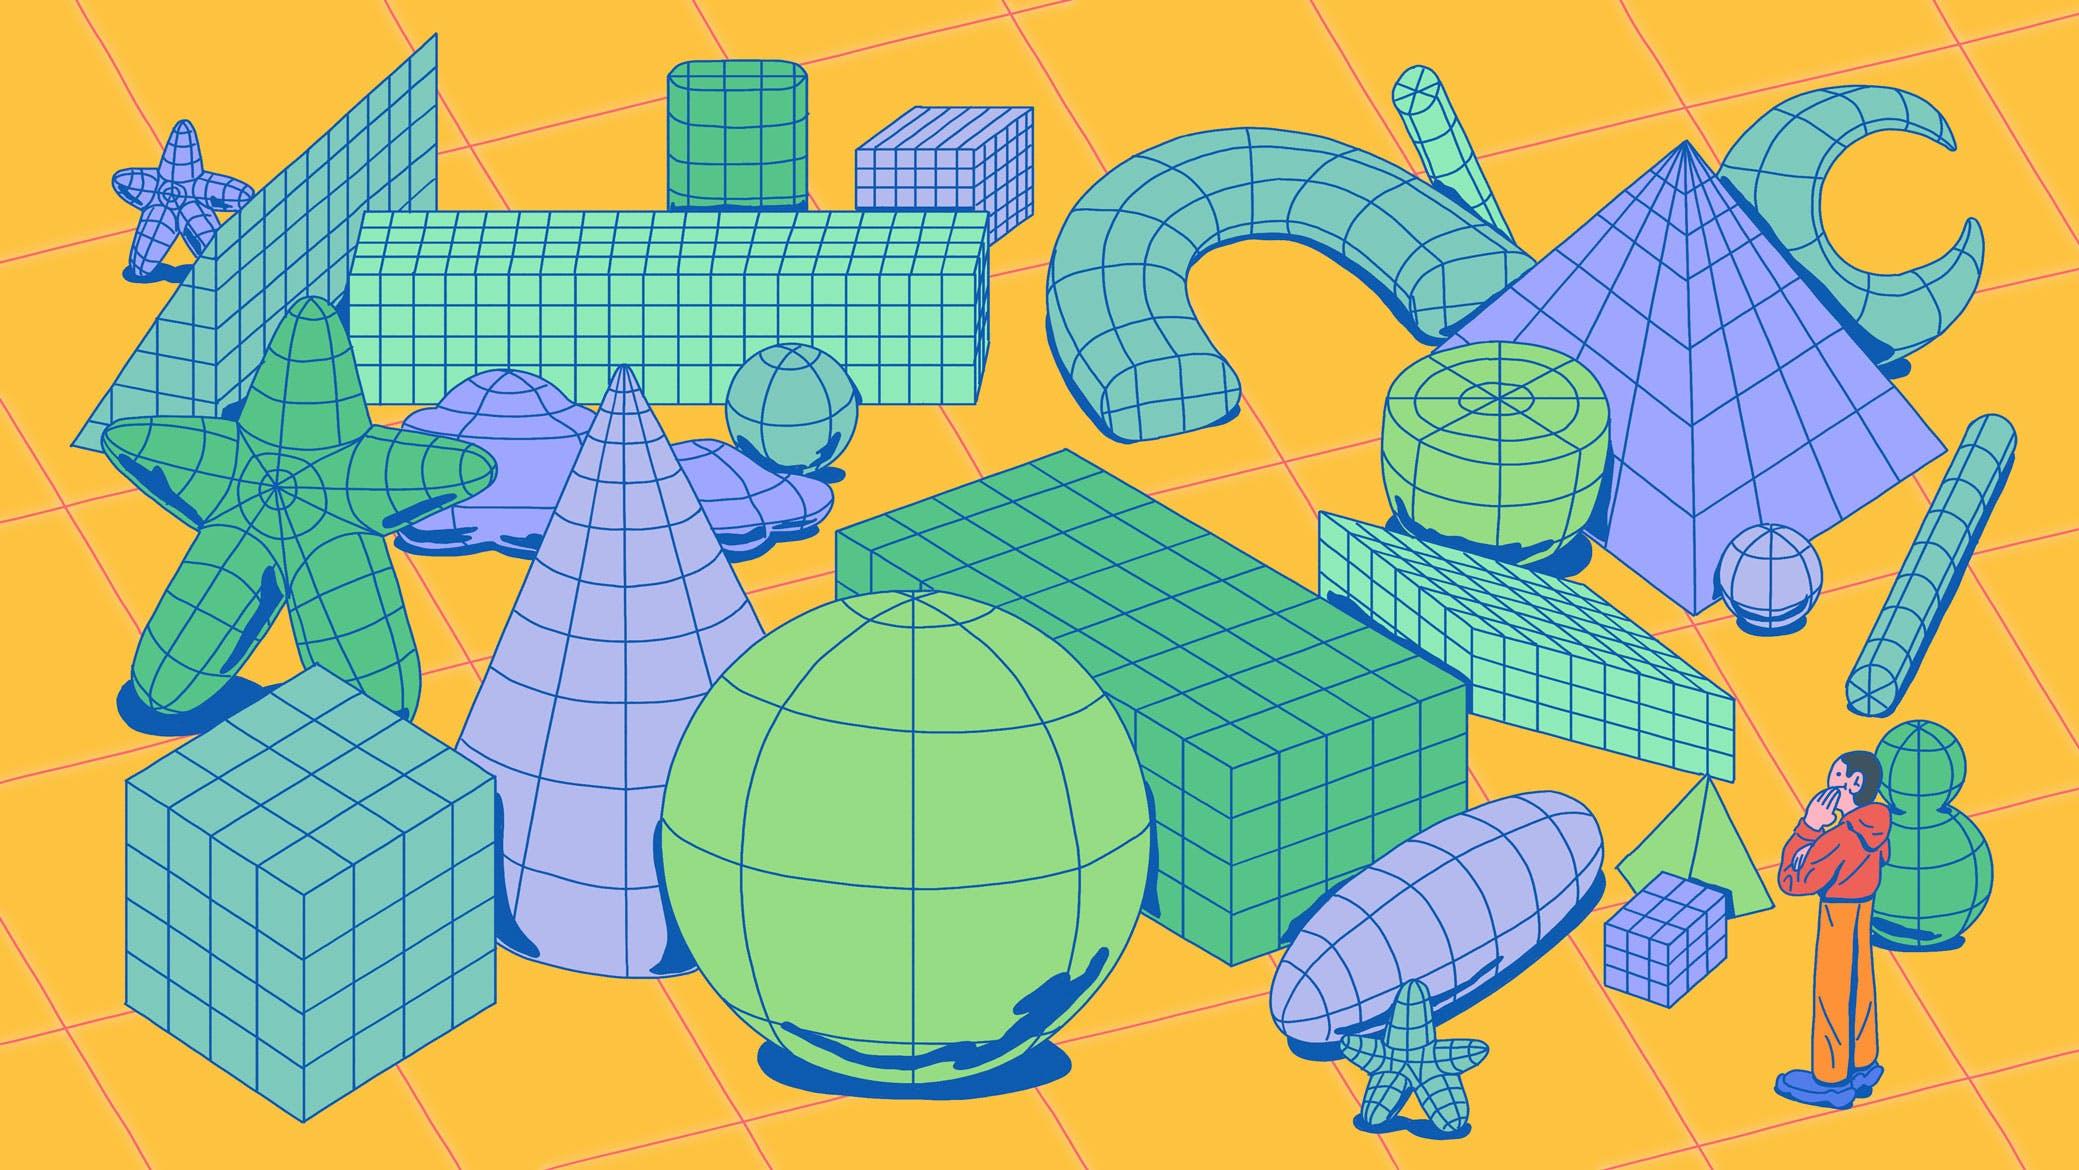 Illustration by Patrick Edell